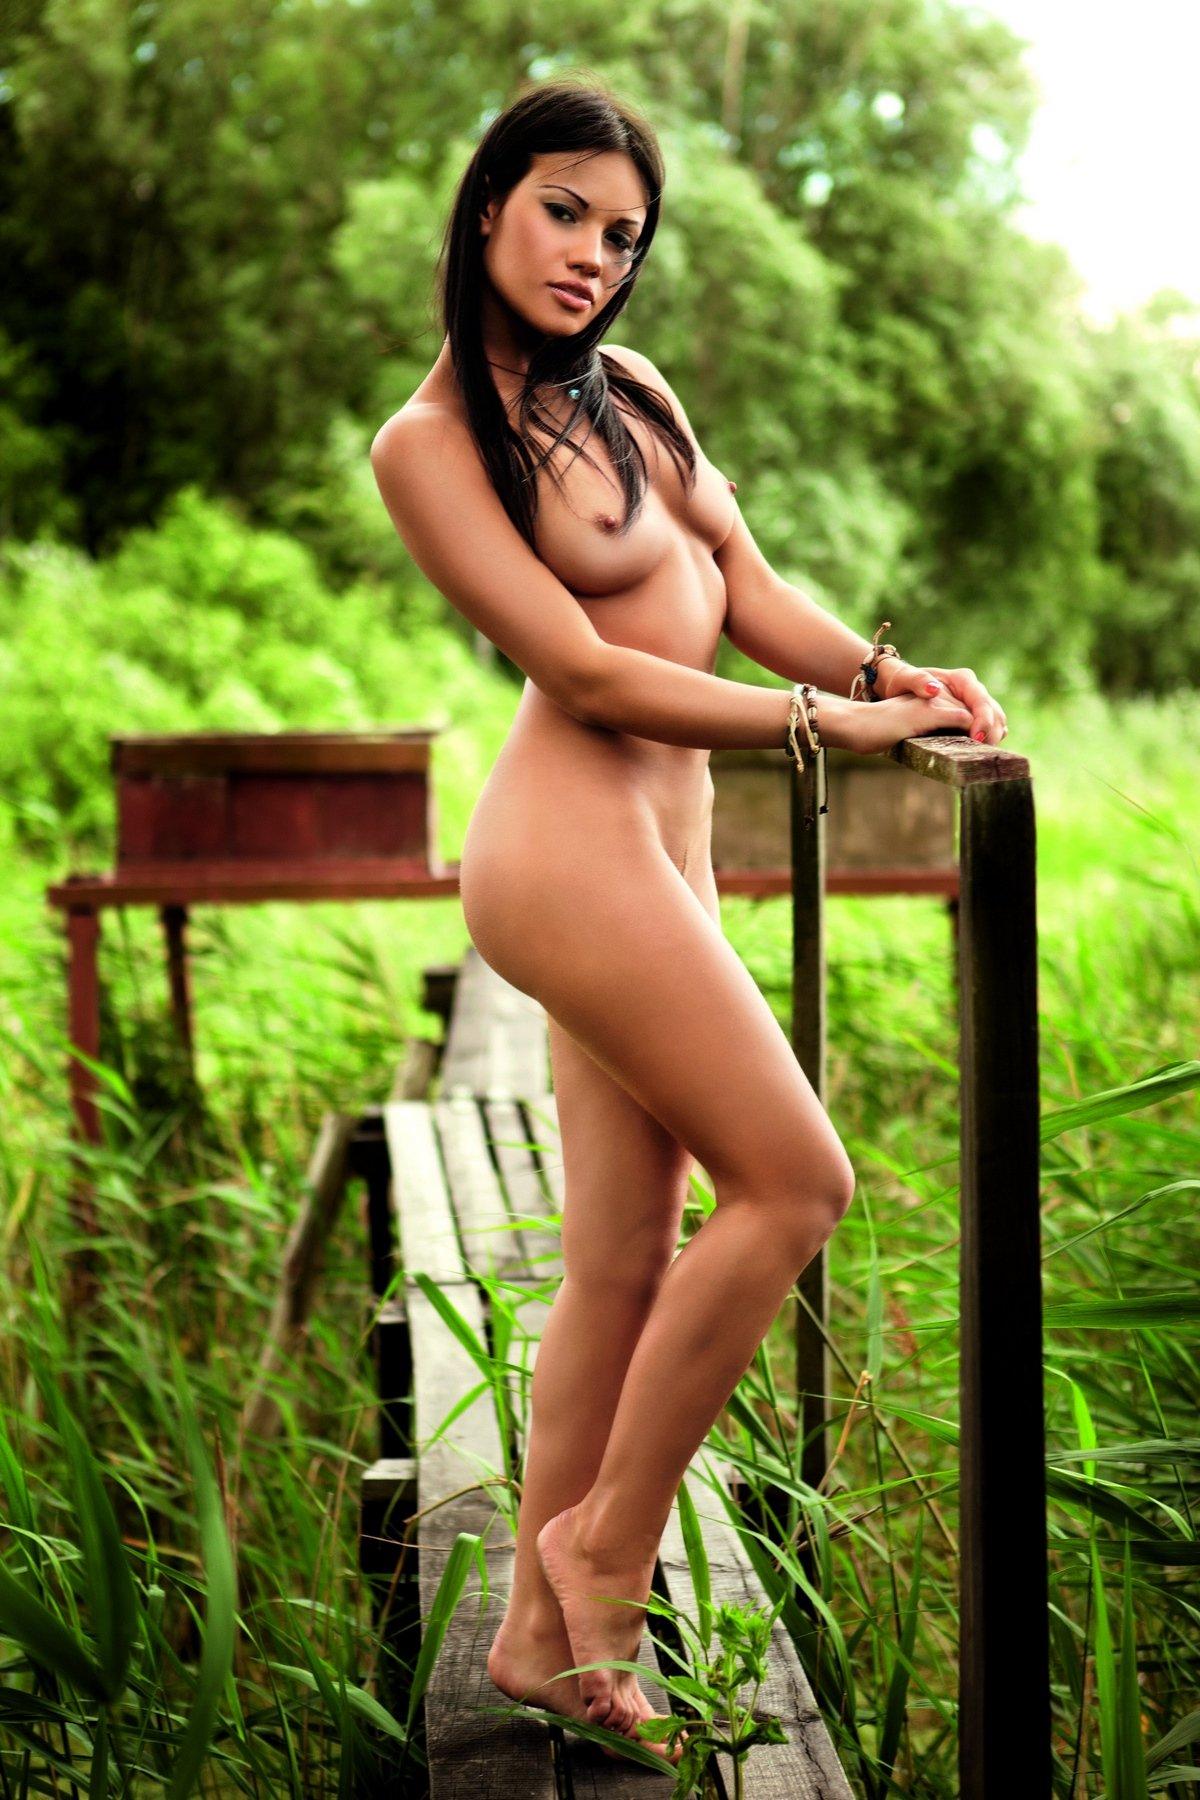 Daria Cybulska позирует на природе для журнала Playboy